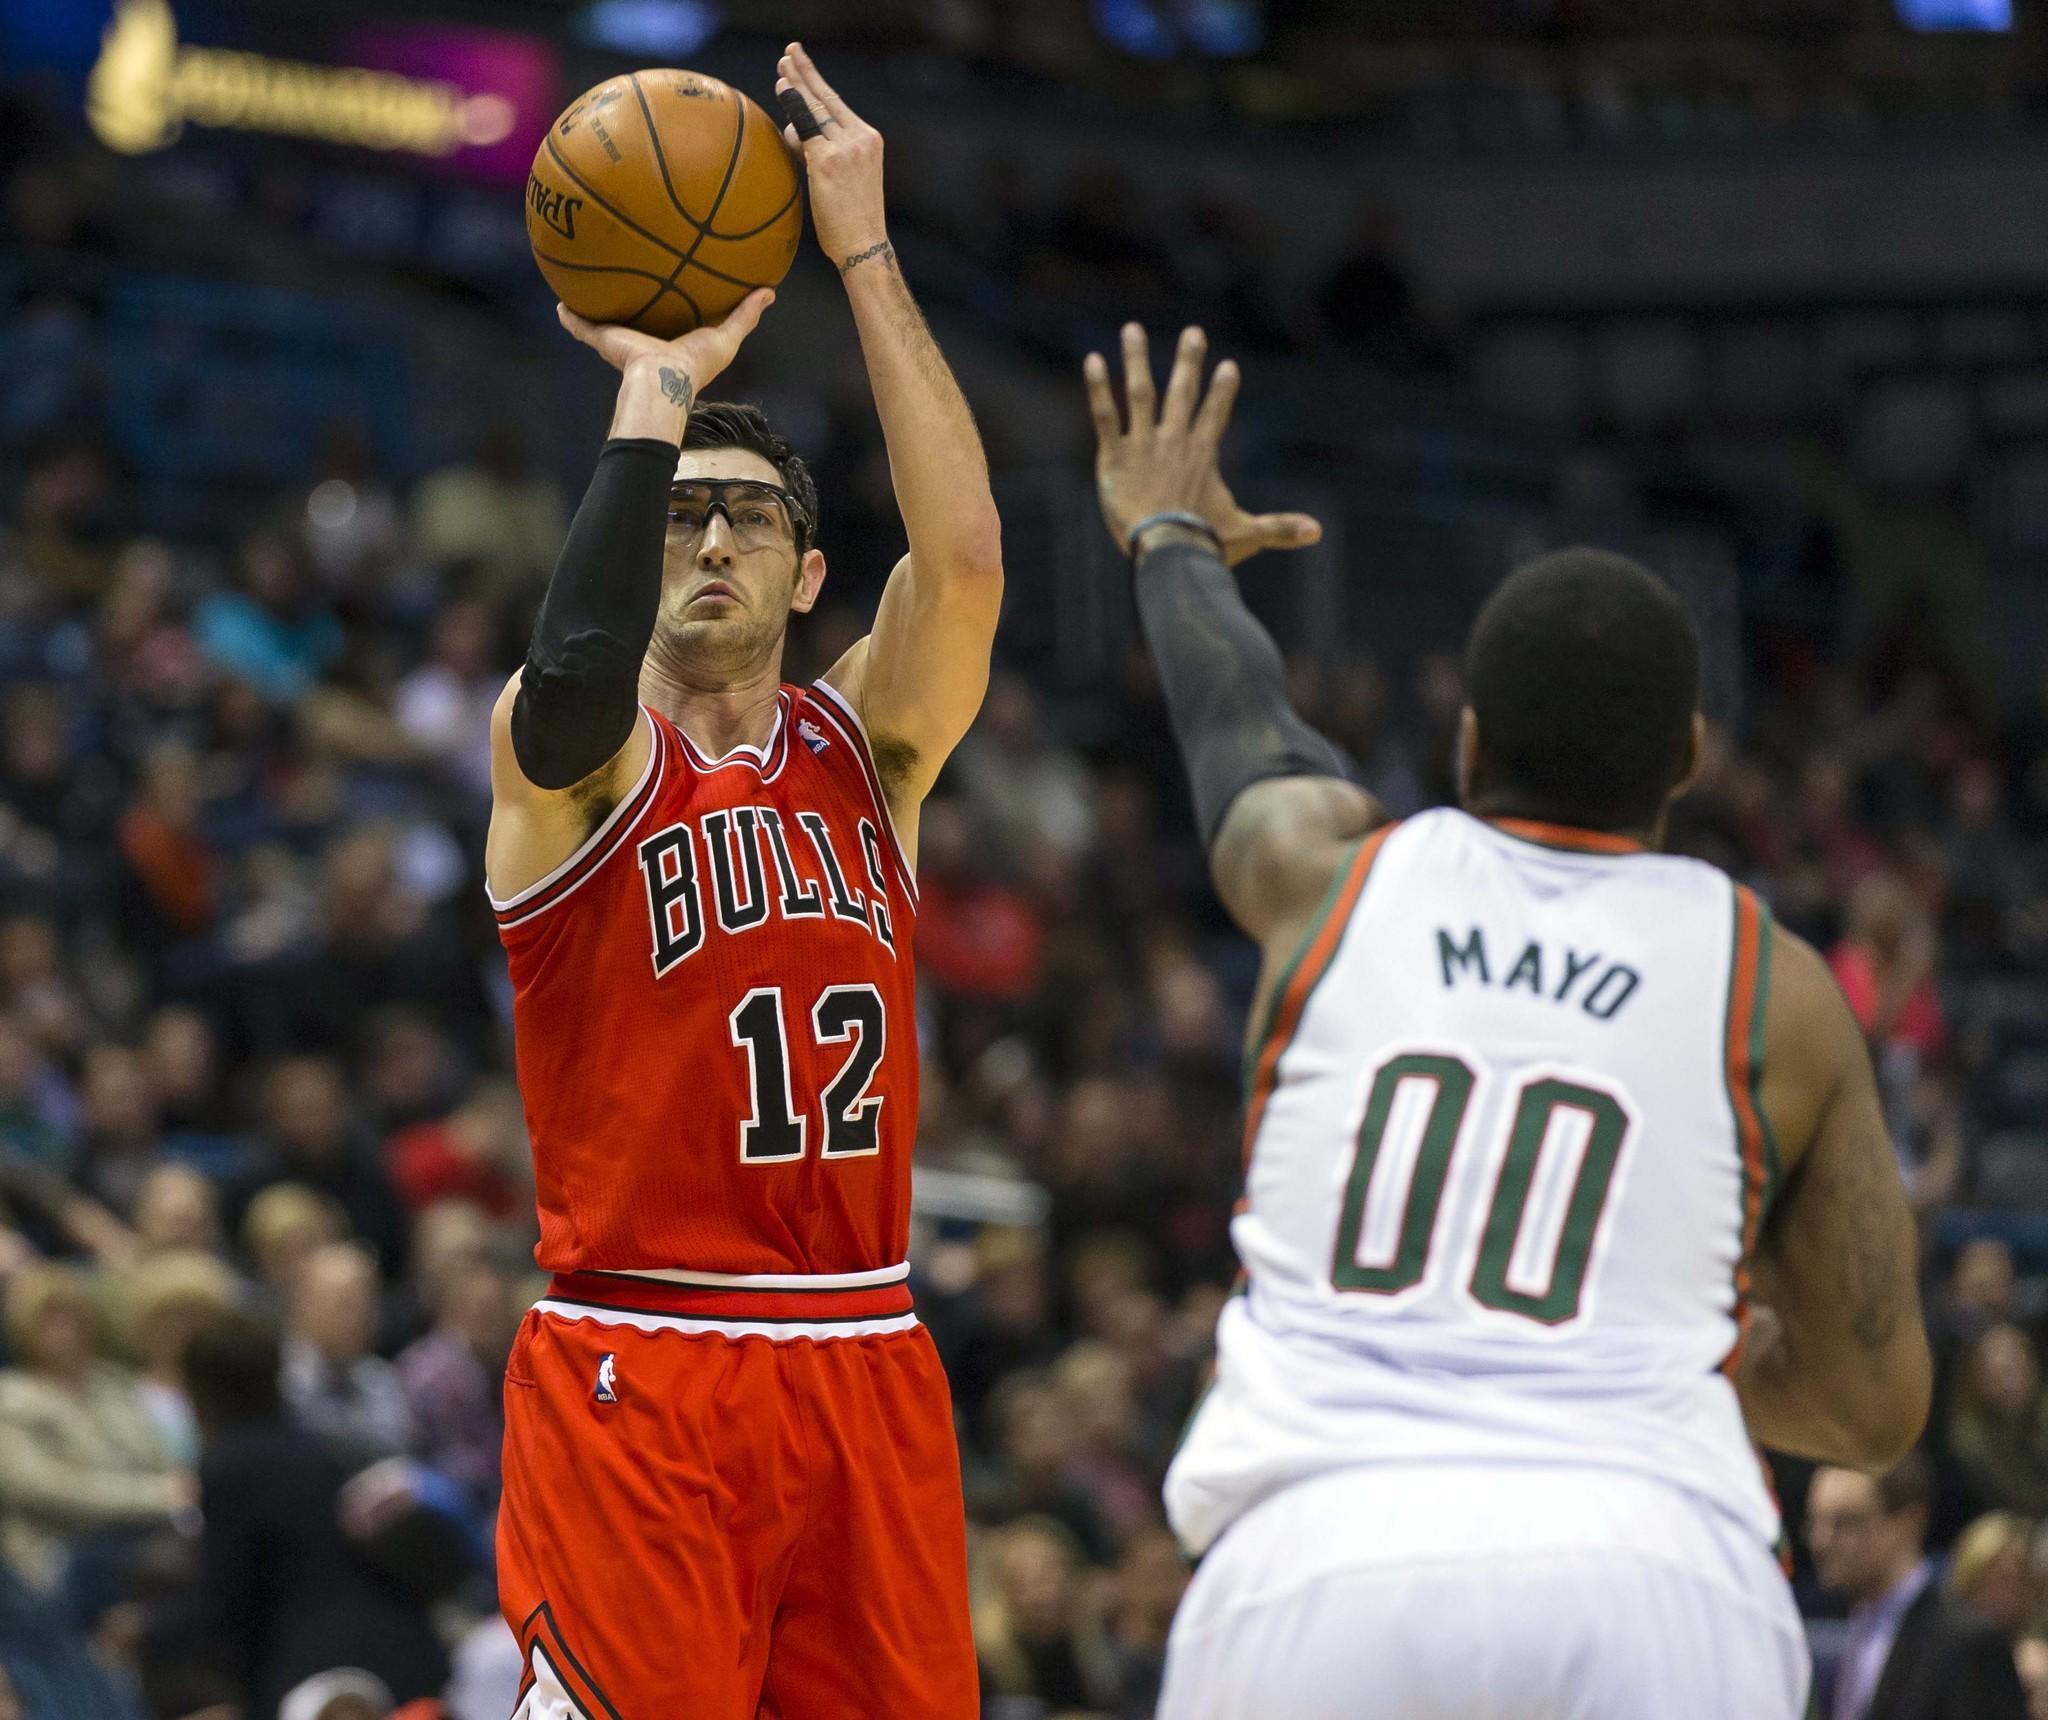 Bulls guard Kirk Hinrich (12) shoots Friday against Bucks guard O.J. Mayo.